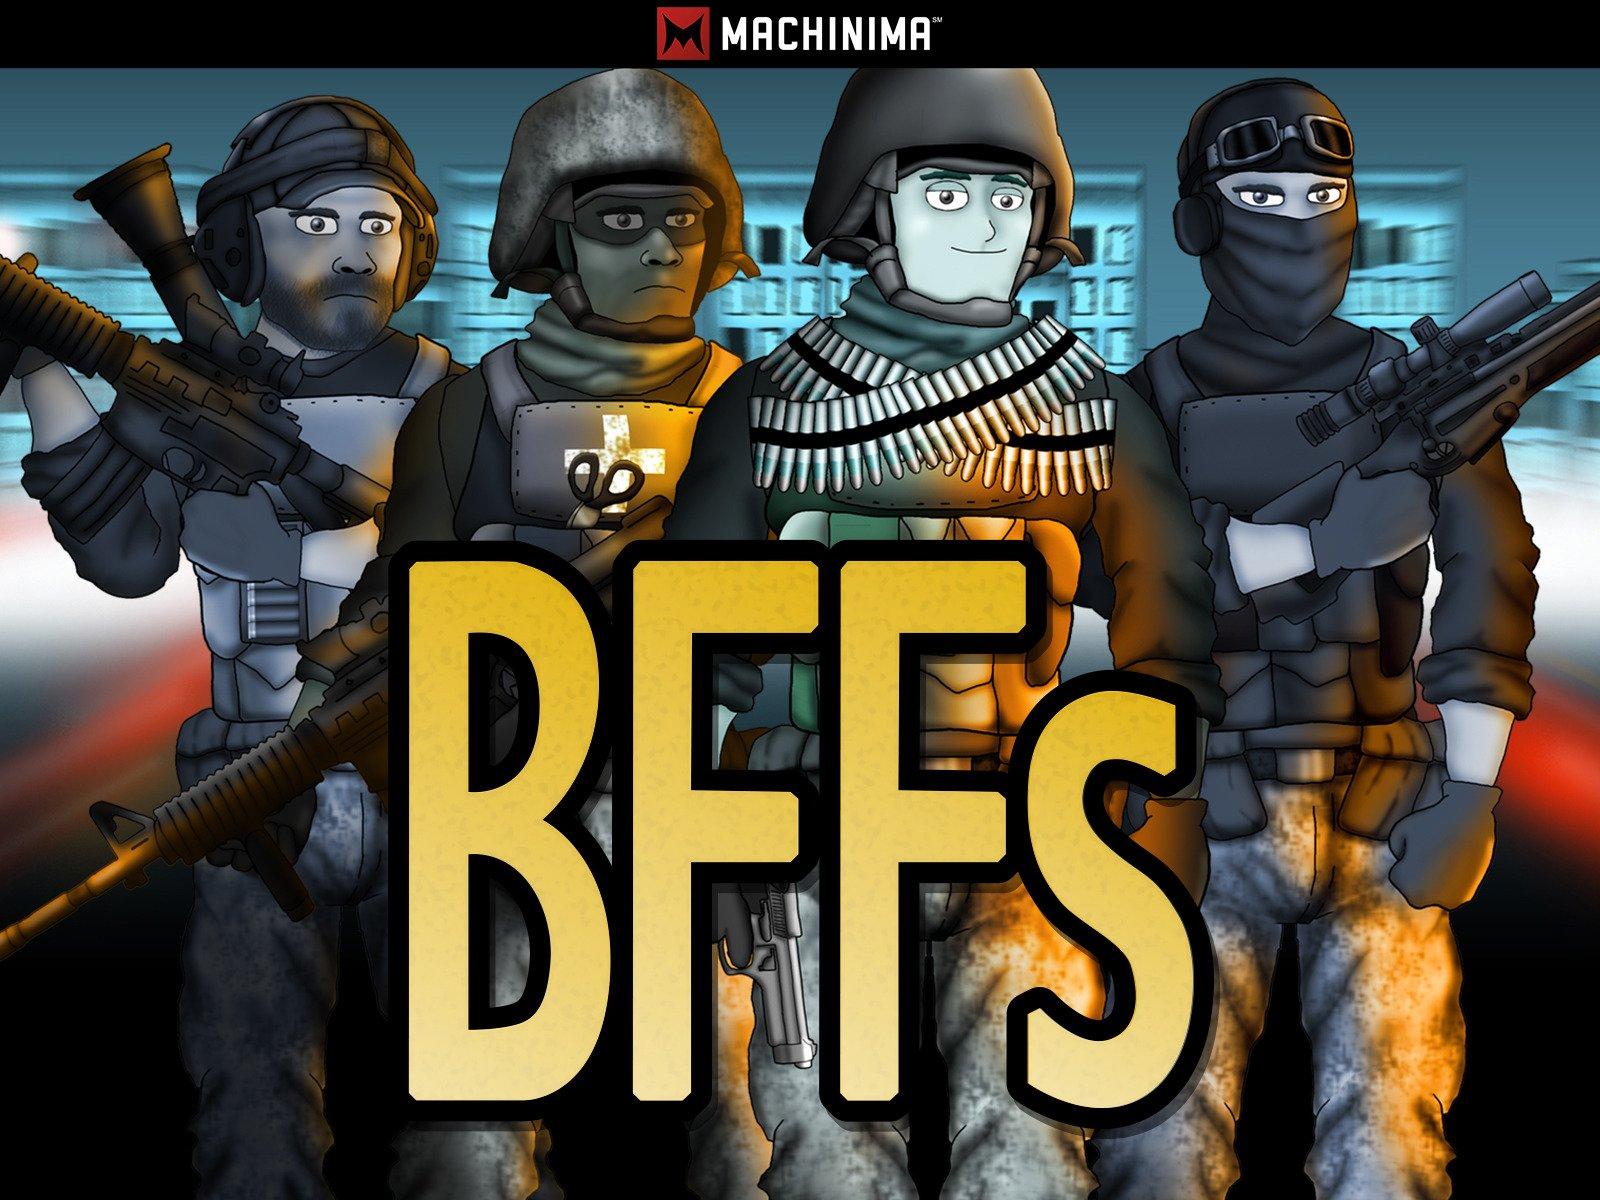 BFFs - Season 2